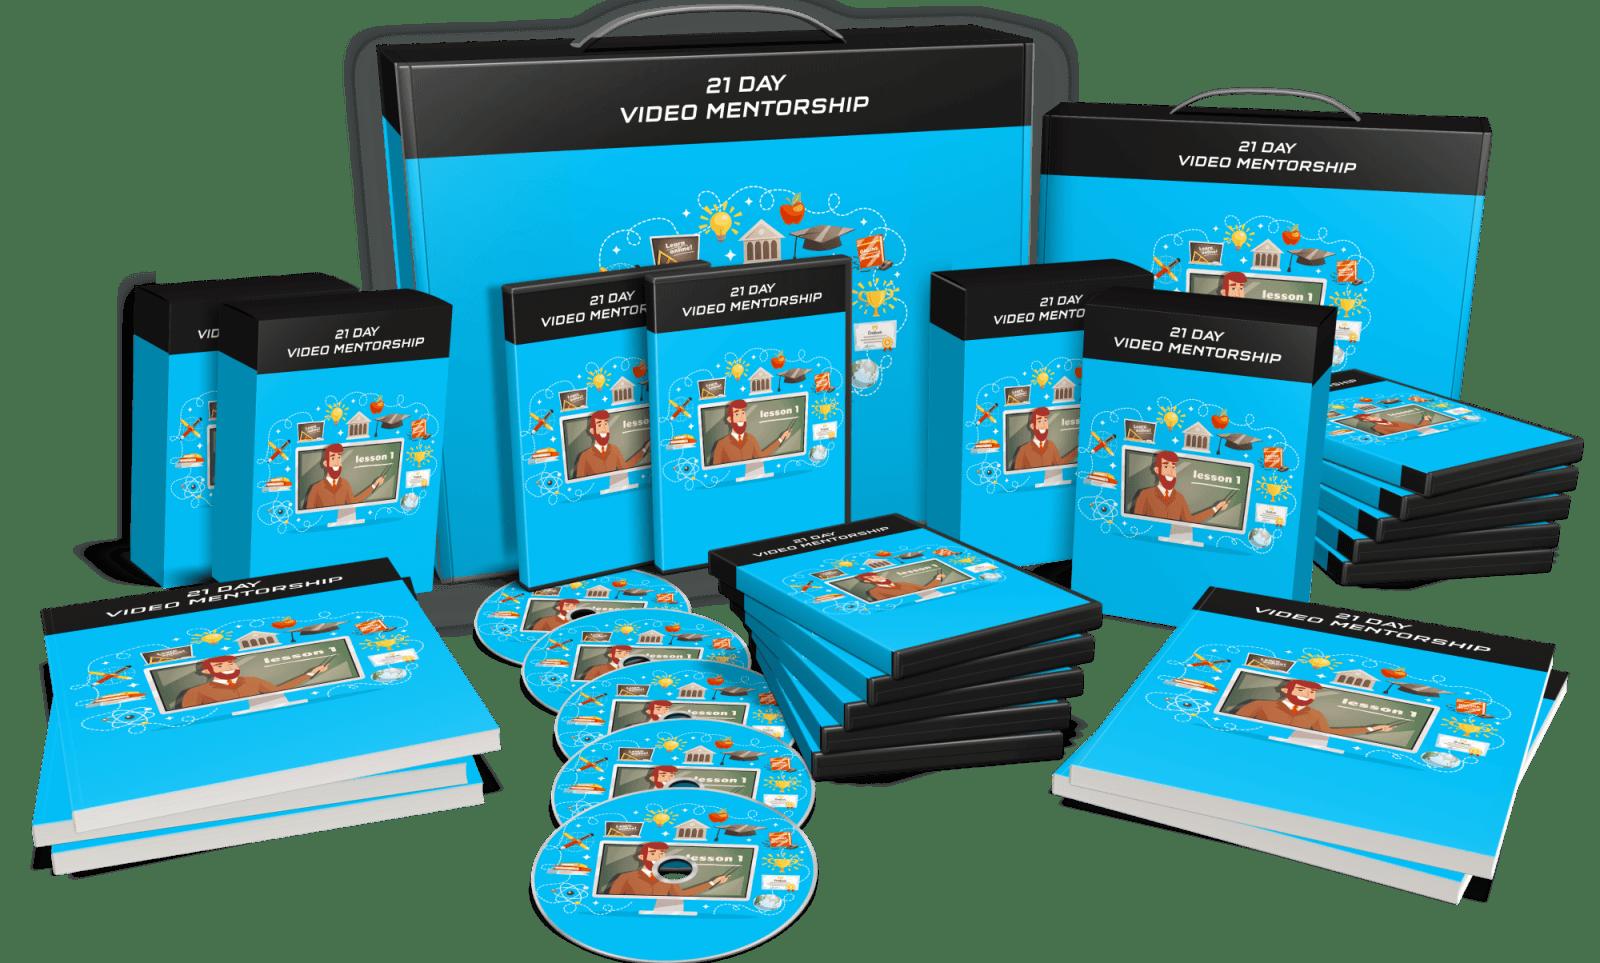 Doodle Maker Bonus 1 - 21 Day Video Mentorship Program